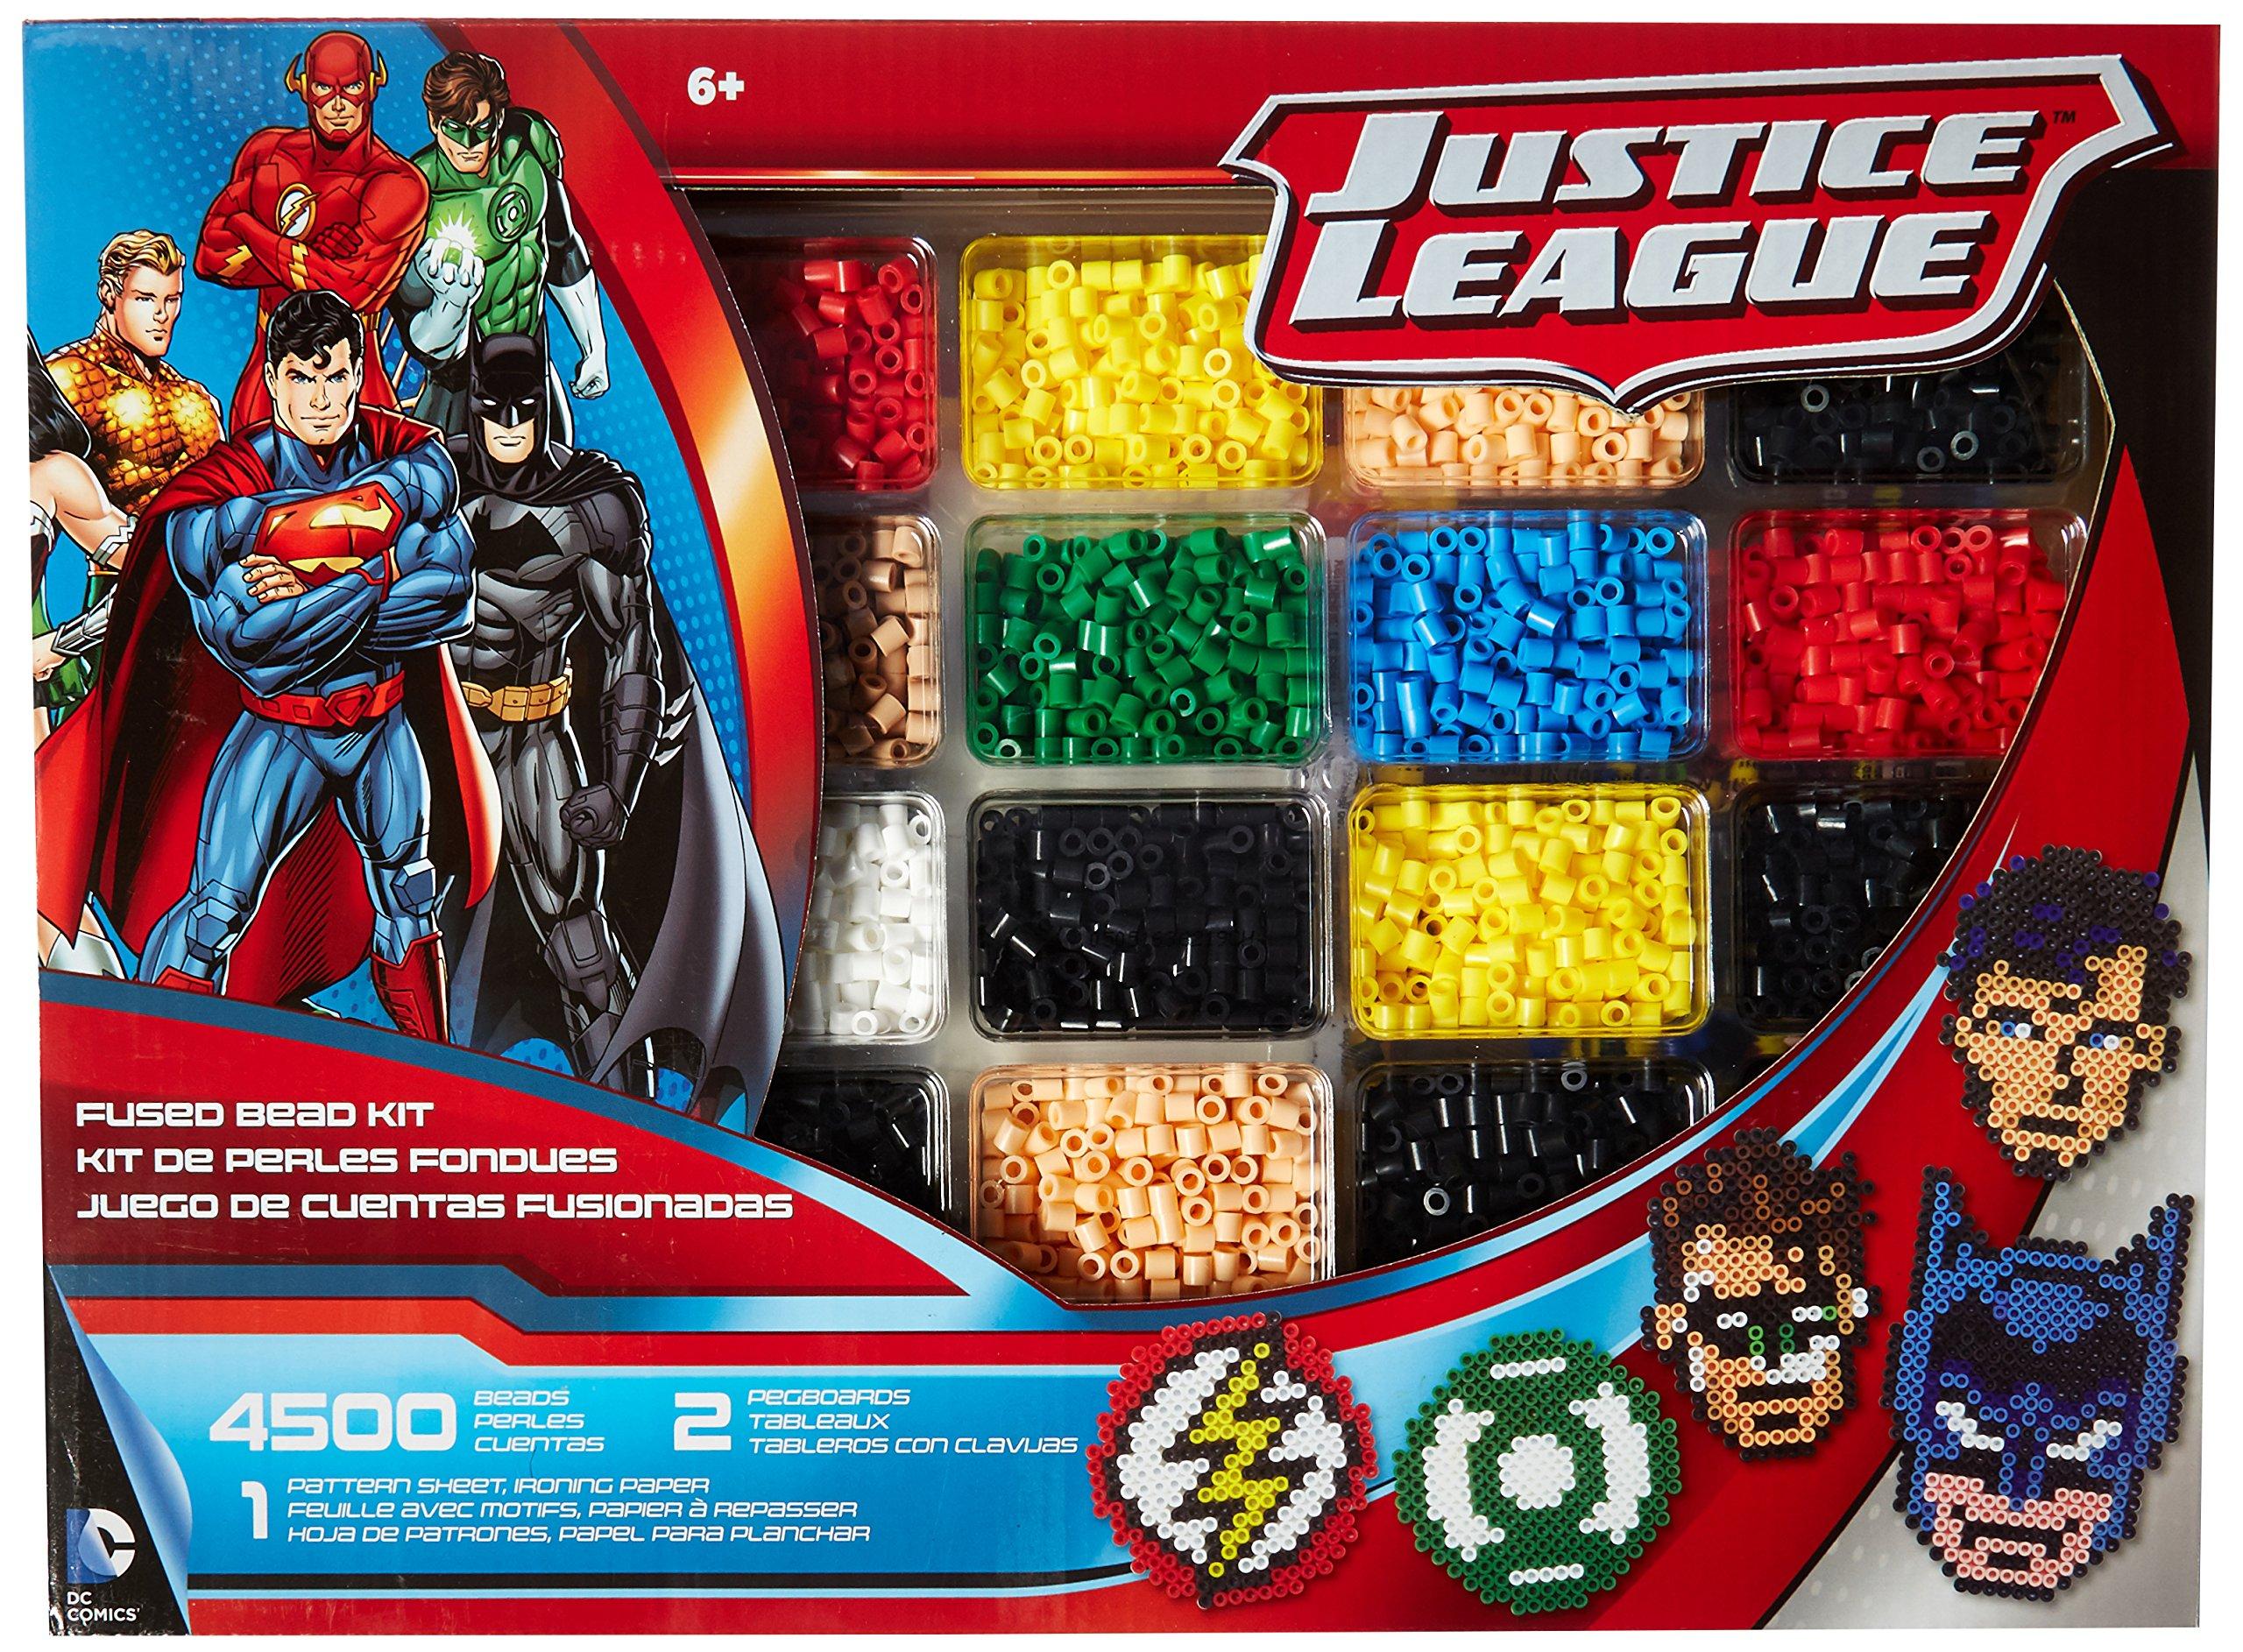 Perler Beads Justice League Superhero Crafts for Kids, 4504 pcs